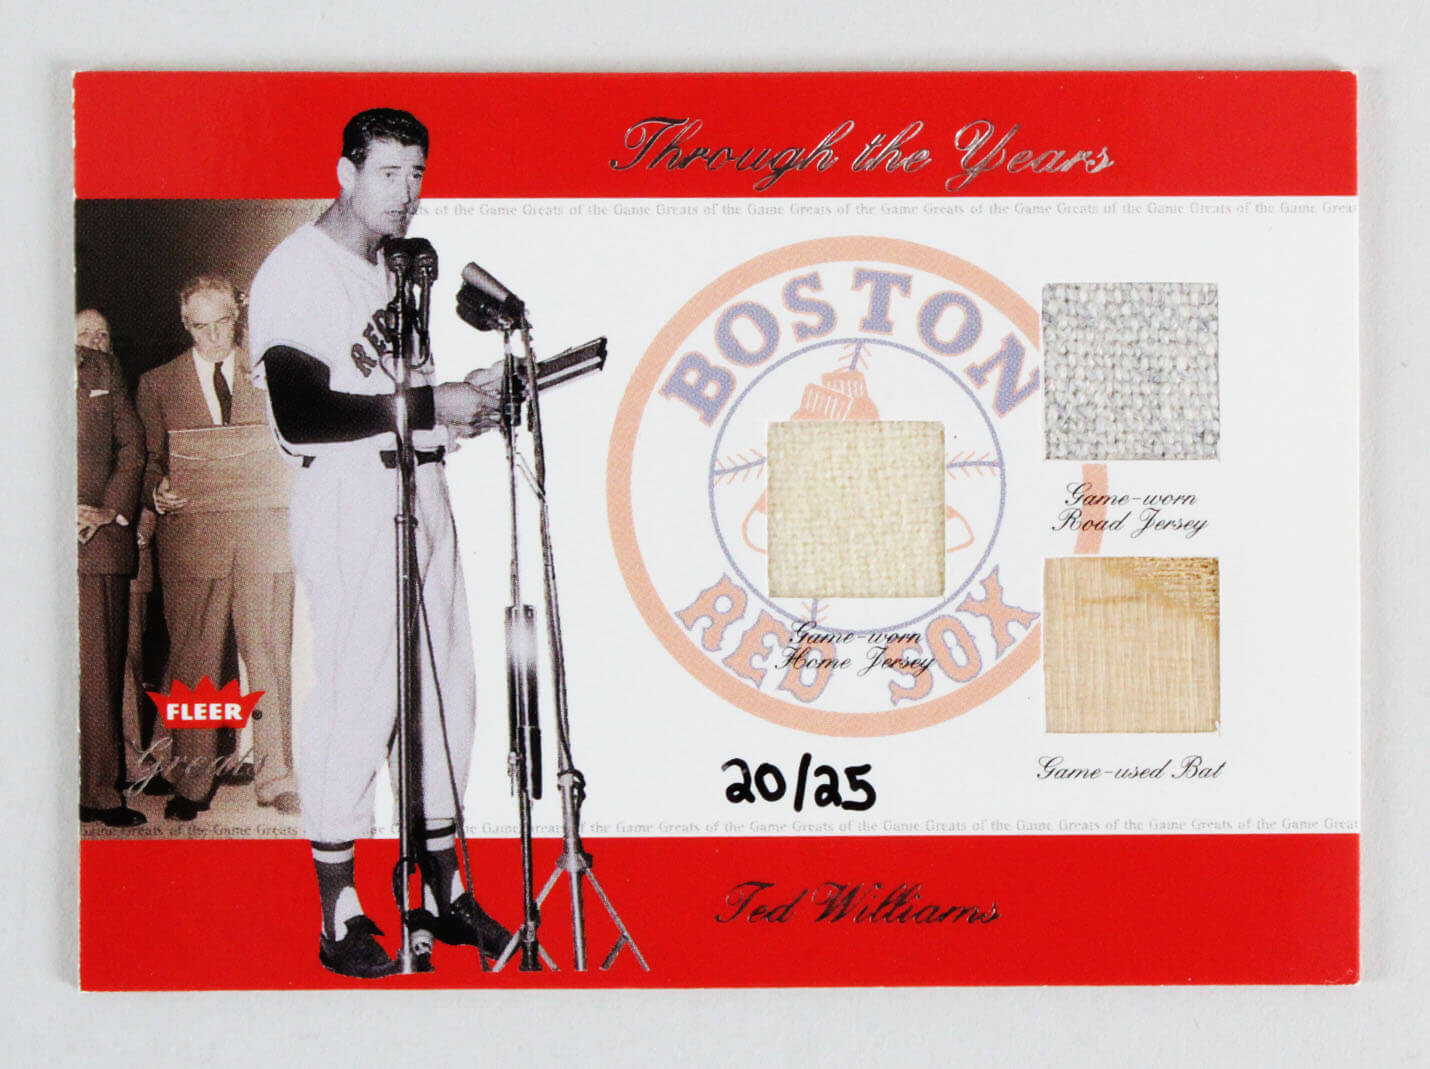 2002 Fleer Greats Ted Williams GU Jersey & Bat Card Baseball Through the Years Boston Red Sox 20/25